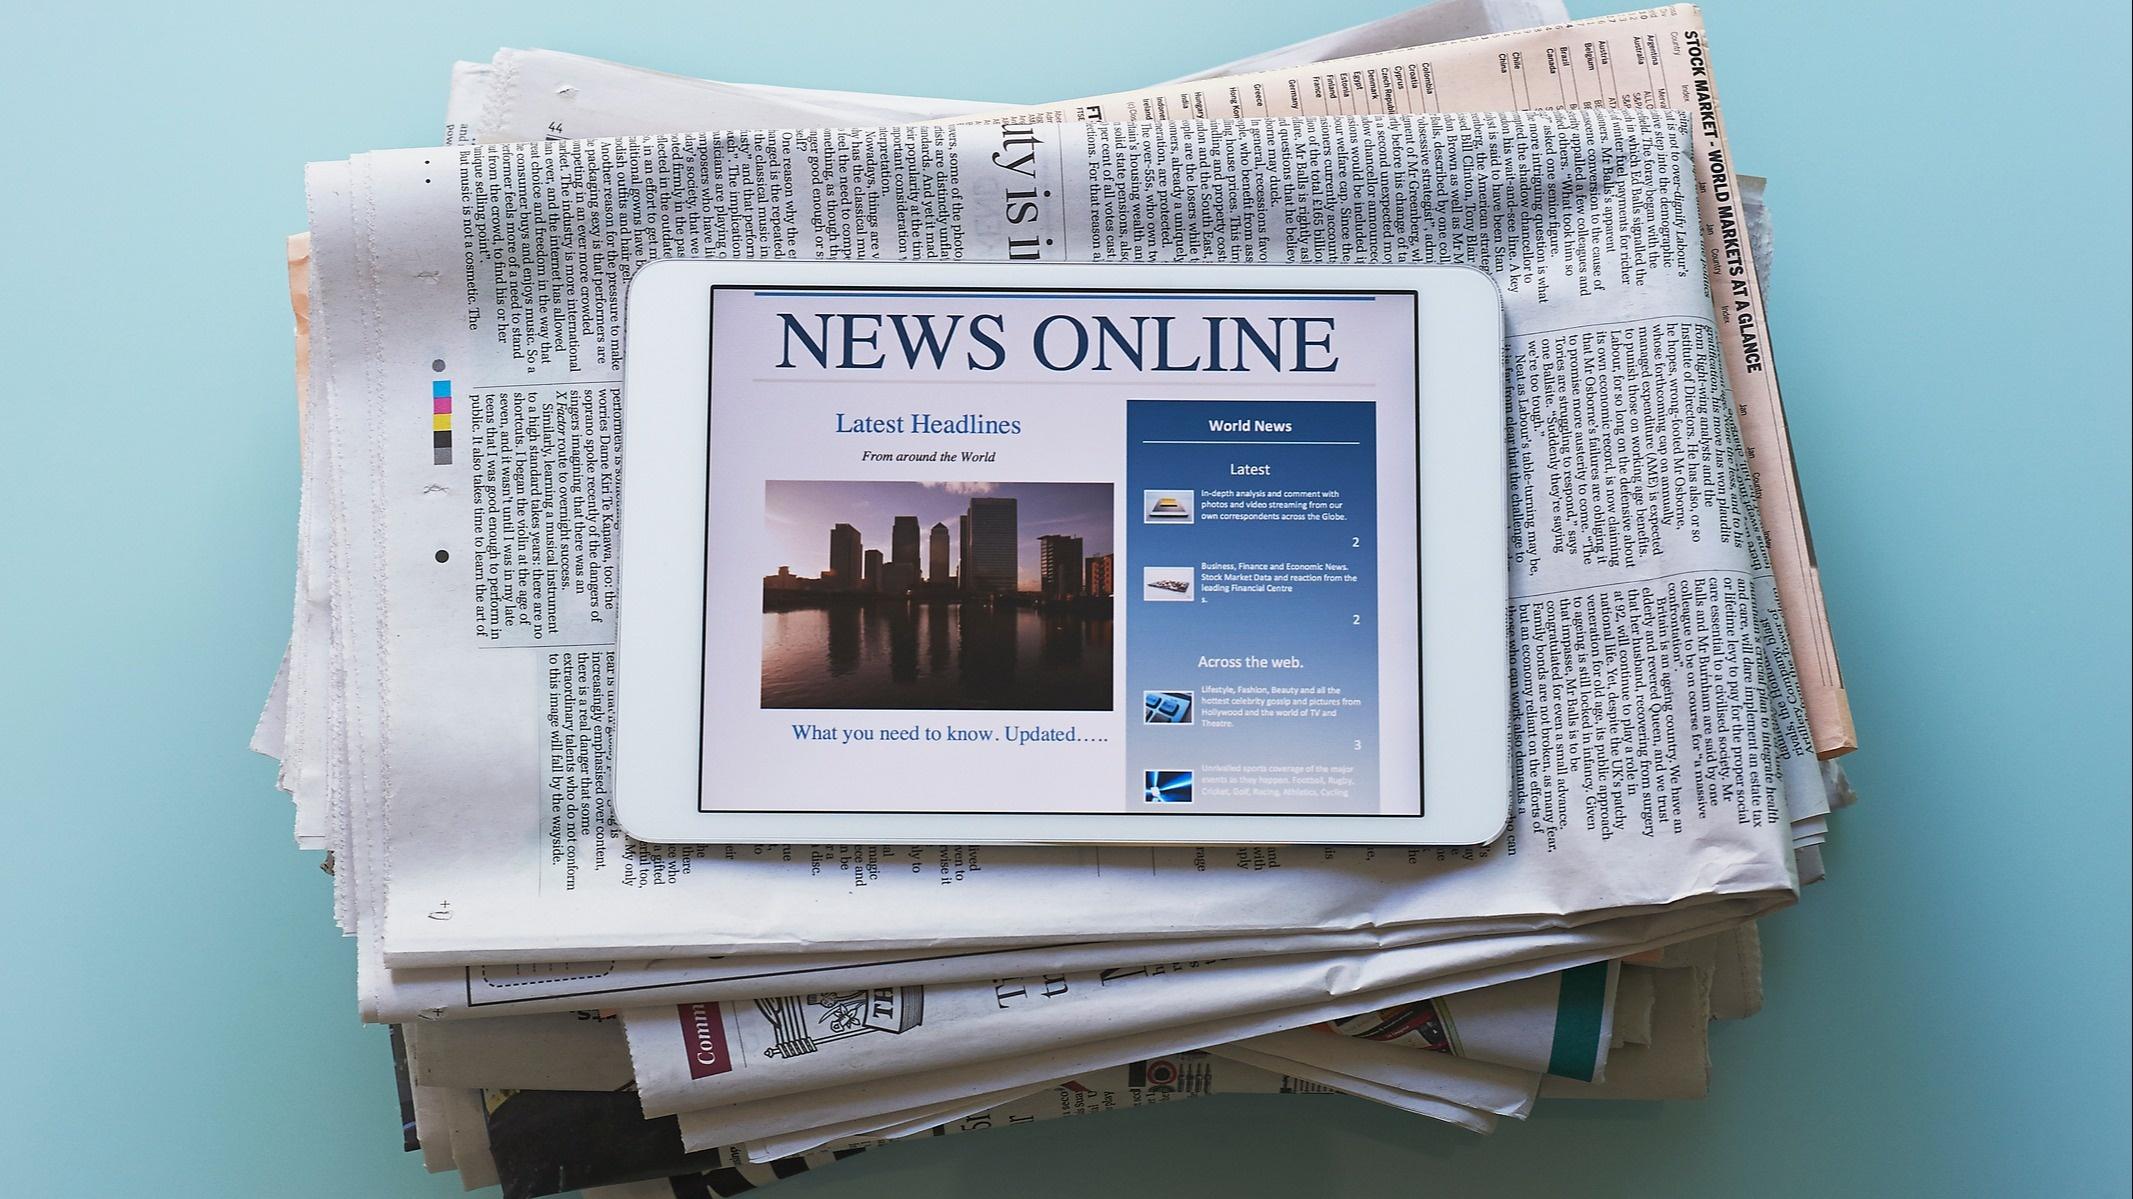 SEO para conteúdos noticiosos